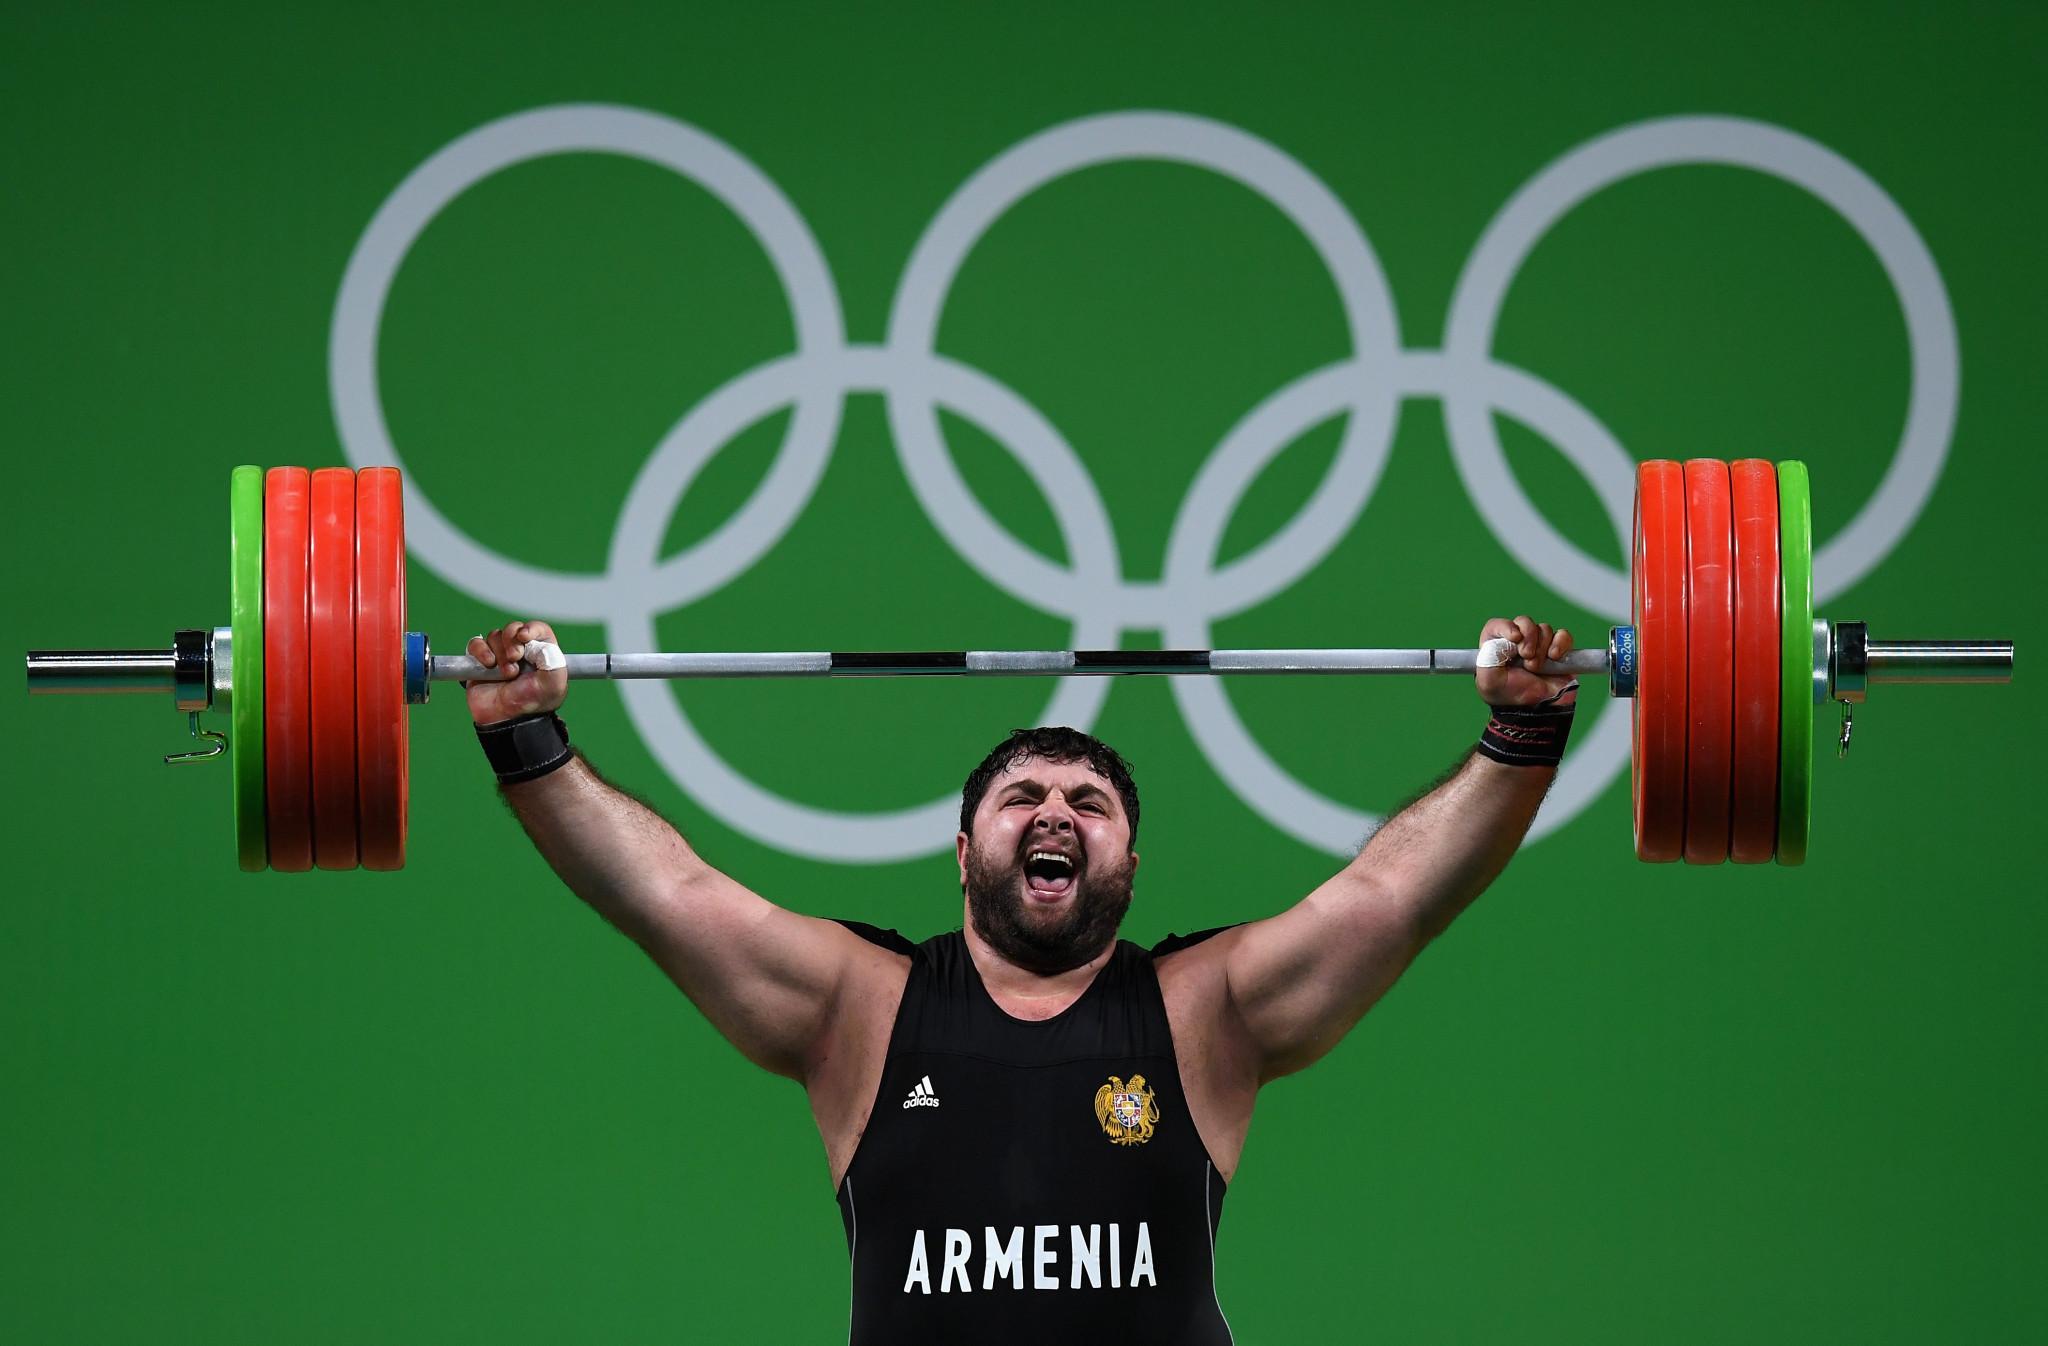 IWF lift doping suspensions against Turkey, Armenia and Azerbaijan early